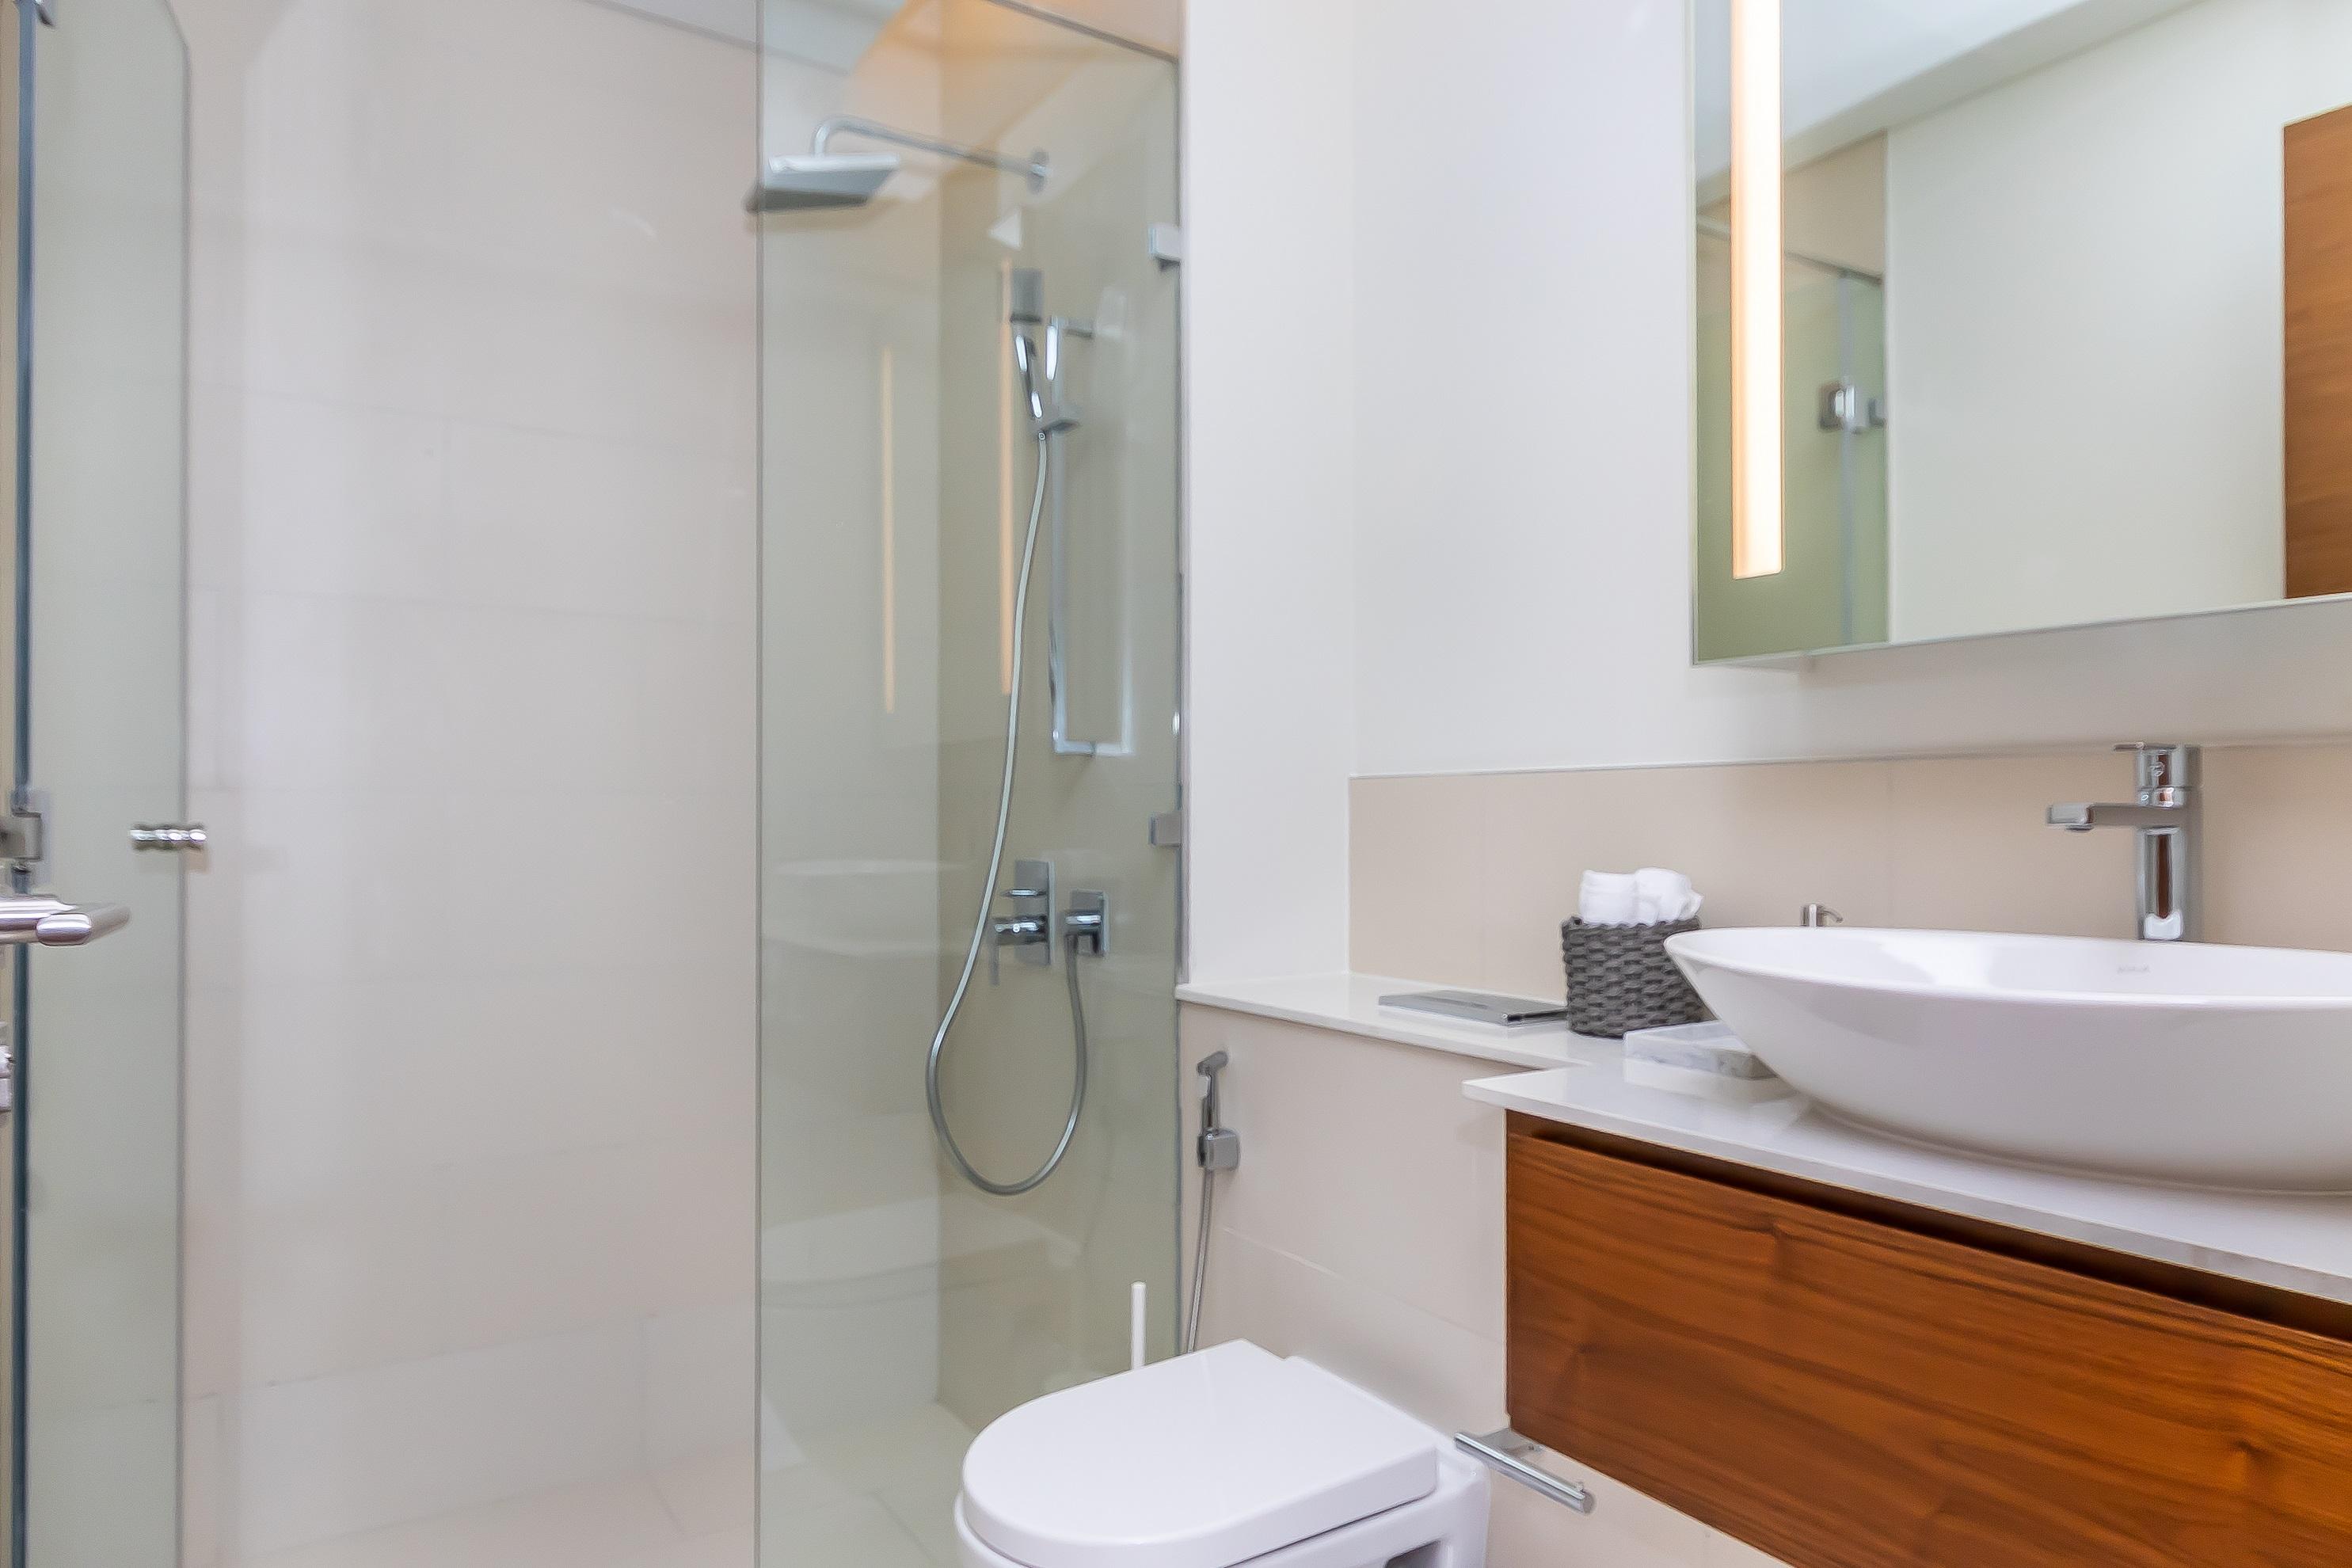 Apartment  Remarkable Value   Unbeatable Location  3 Beds City Walk B 10 309 photo 24142309